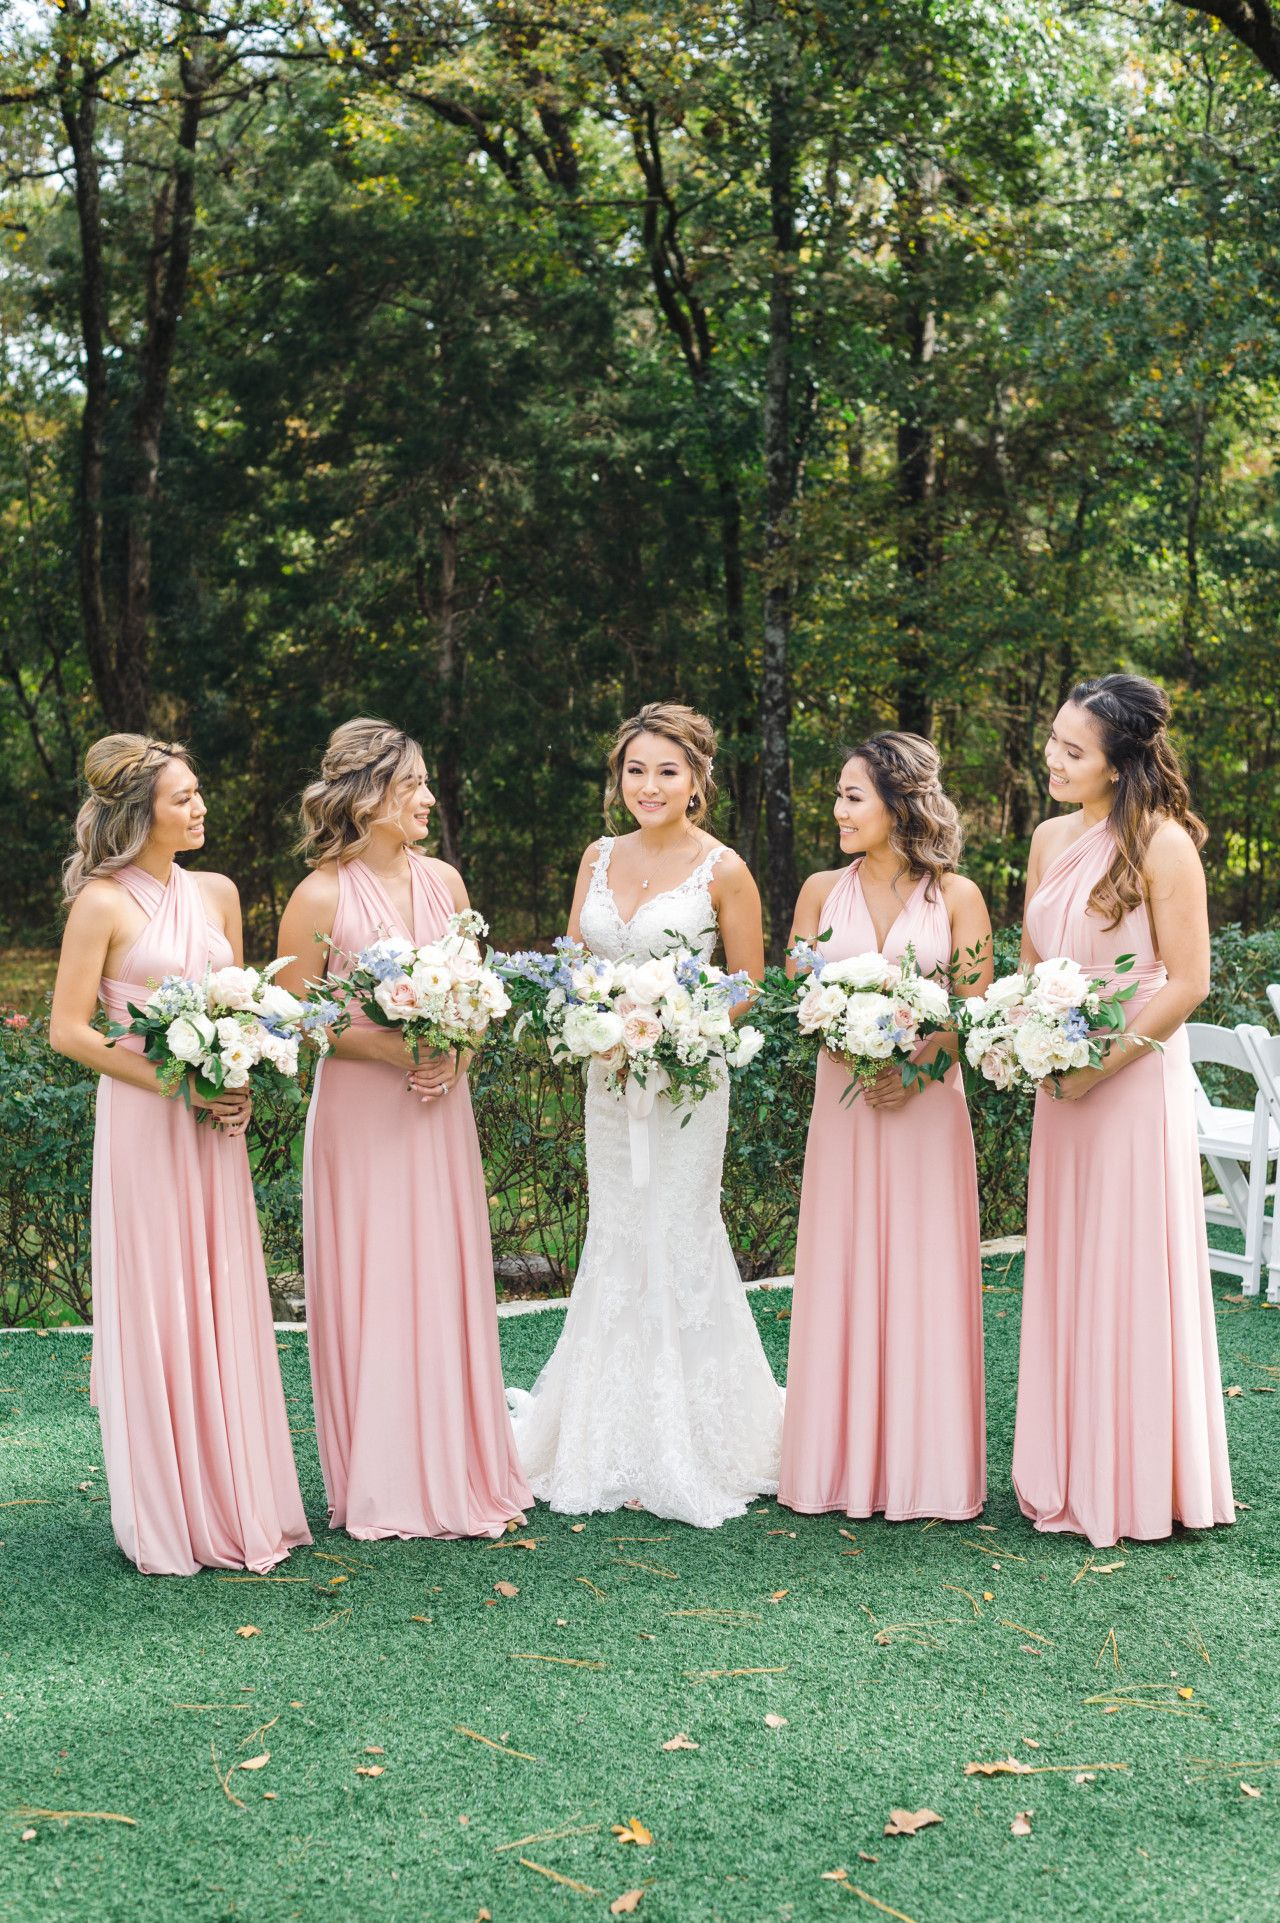 Poetry Hall Pastel Bridesmaid Dresses Pastel Bridesmaids Blush